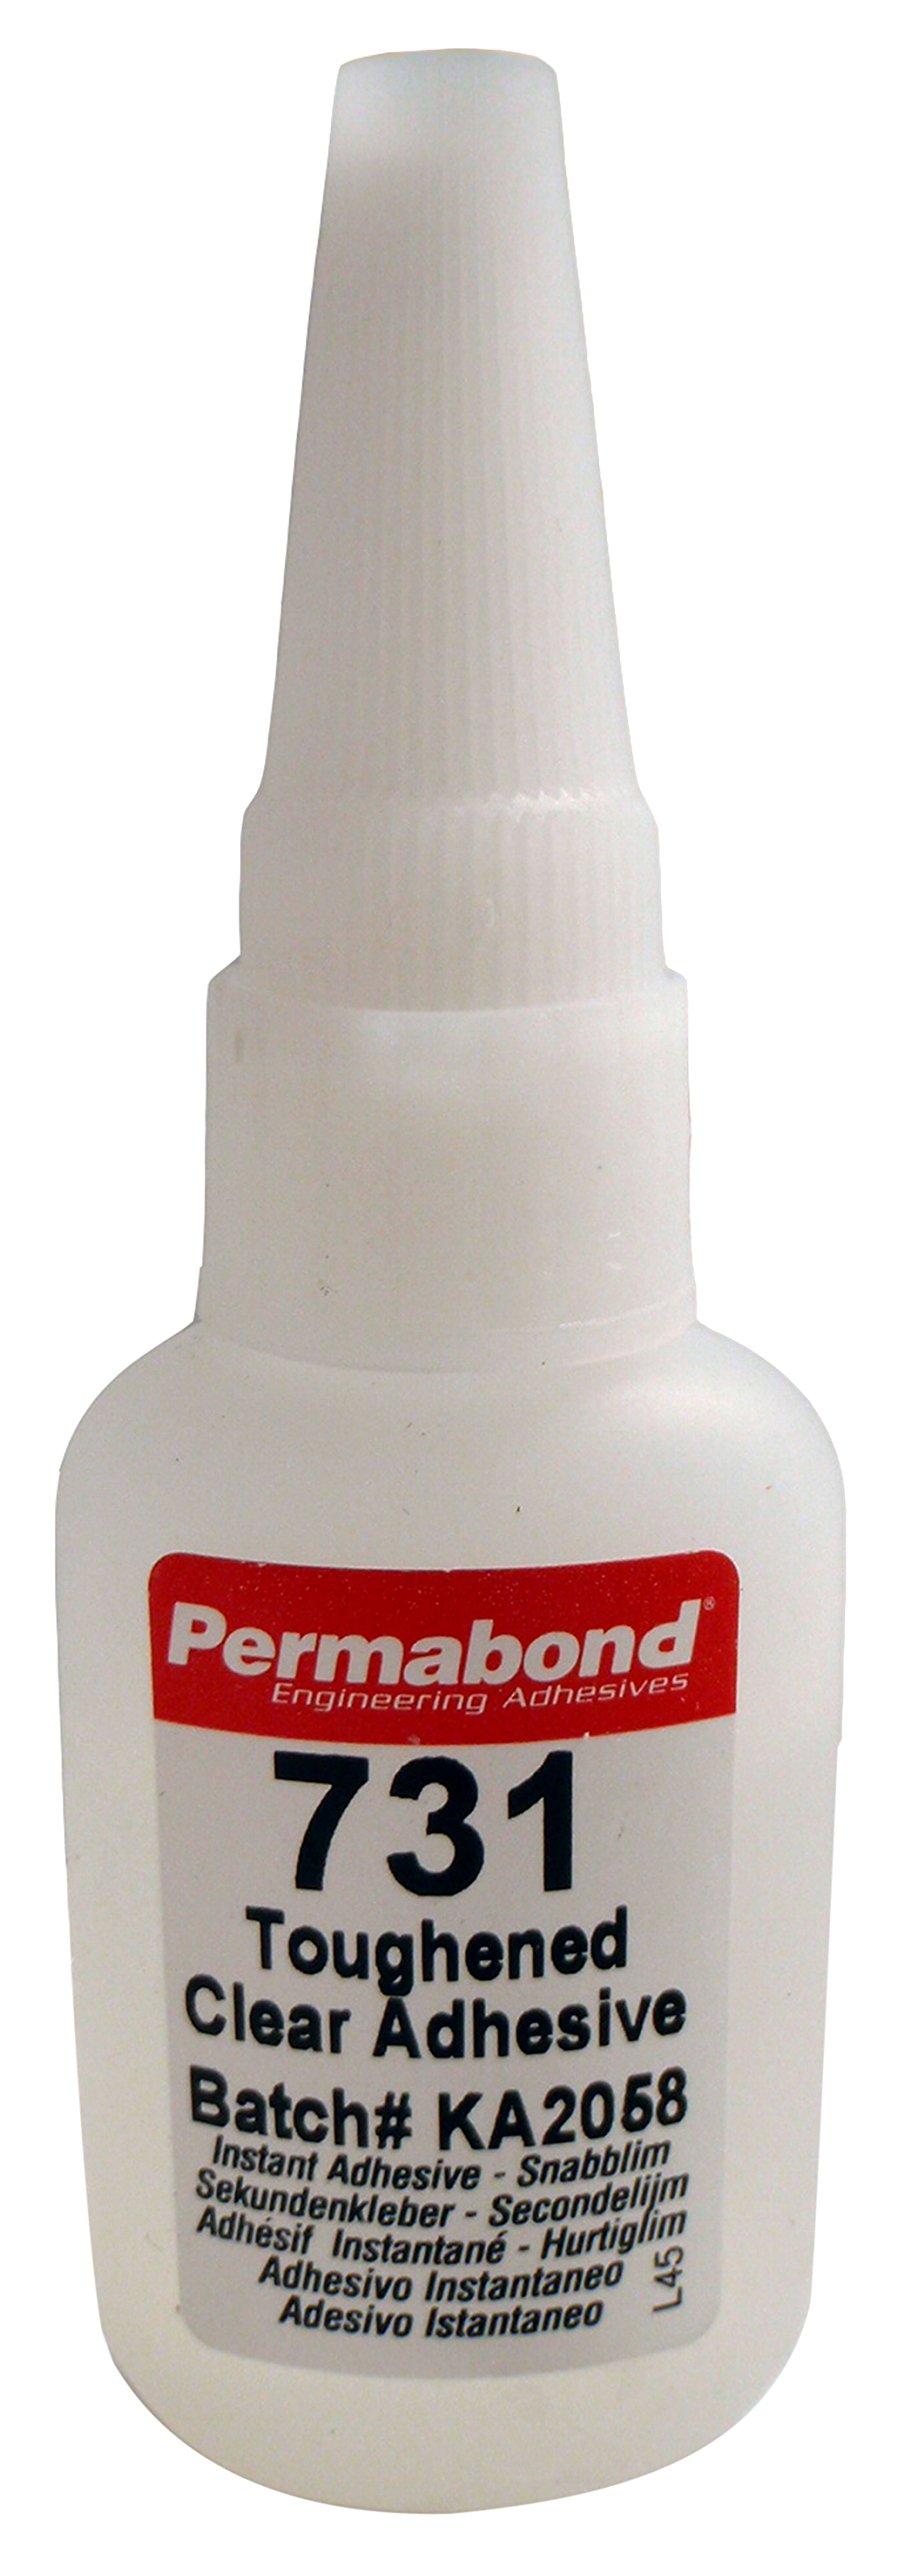 Permabond 731 Superglue, 20 g